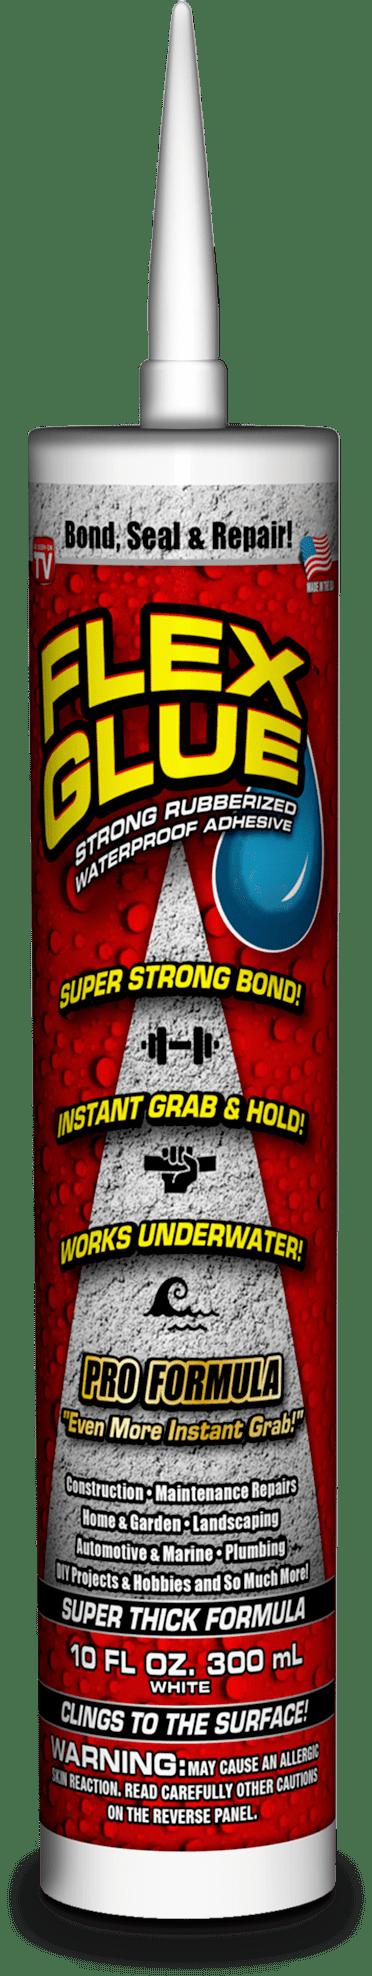 Flex Glue Strong Rubberized Waterproof Adhesive, 10-oz Pro Formula by Swift Response, LLC